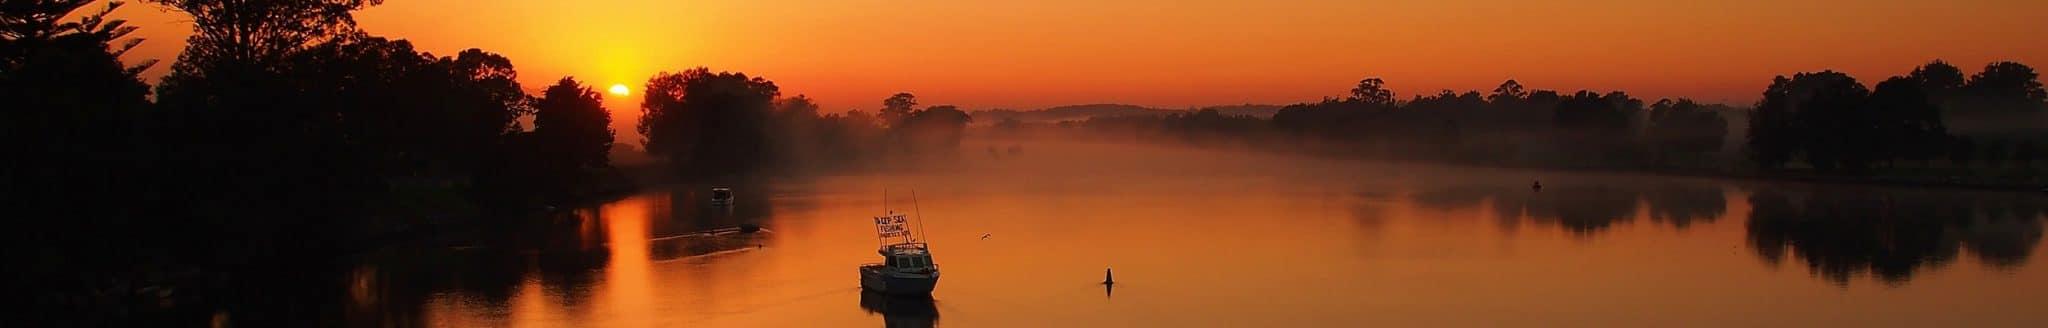 Moruya River, Eurobodalla